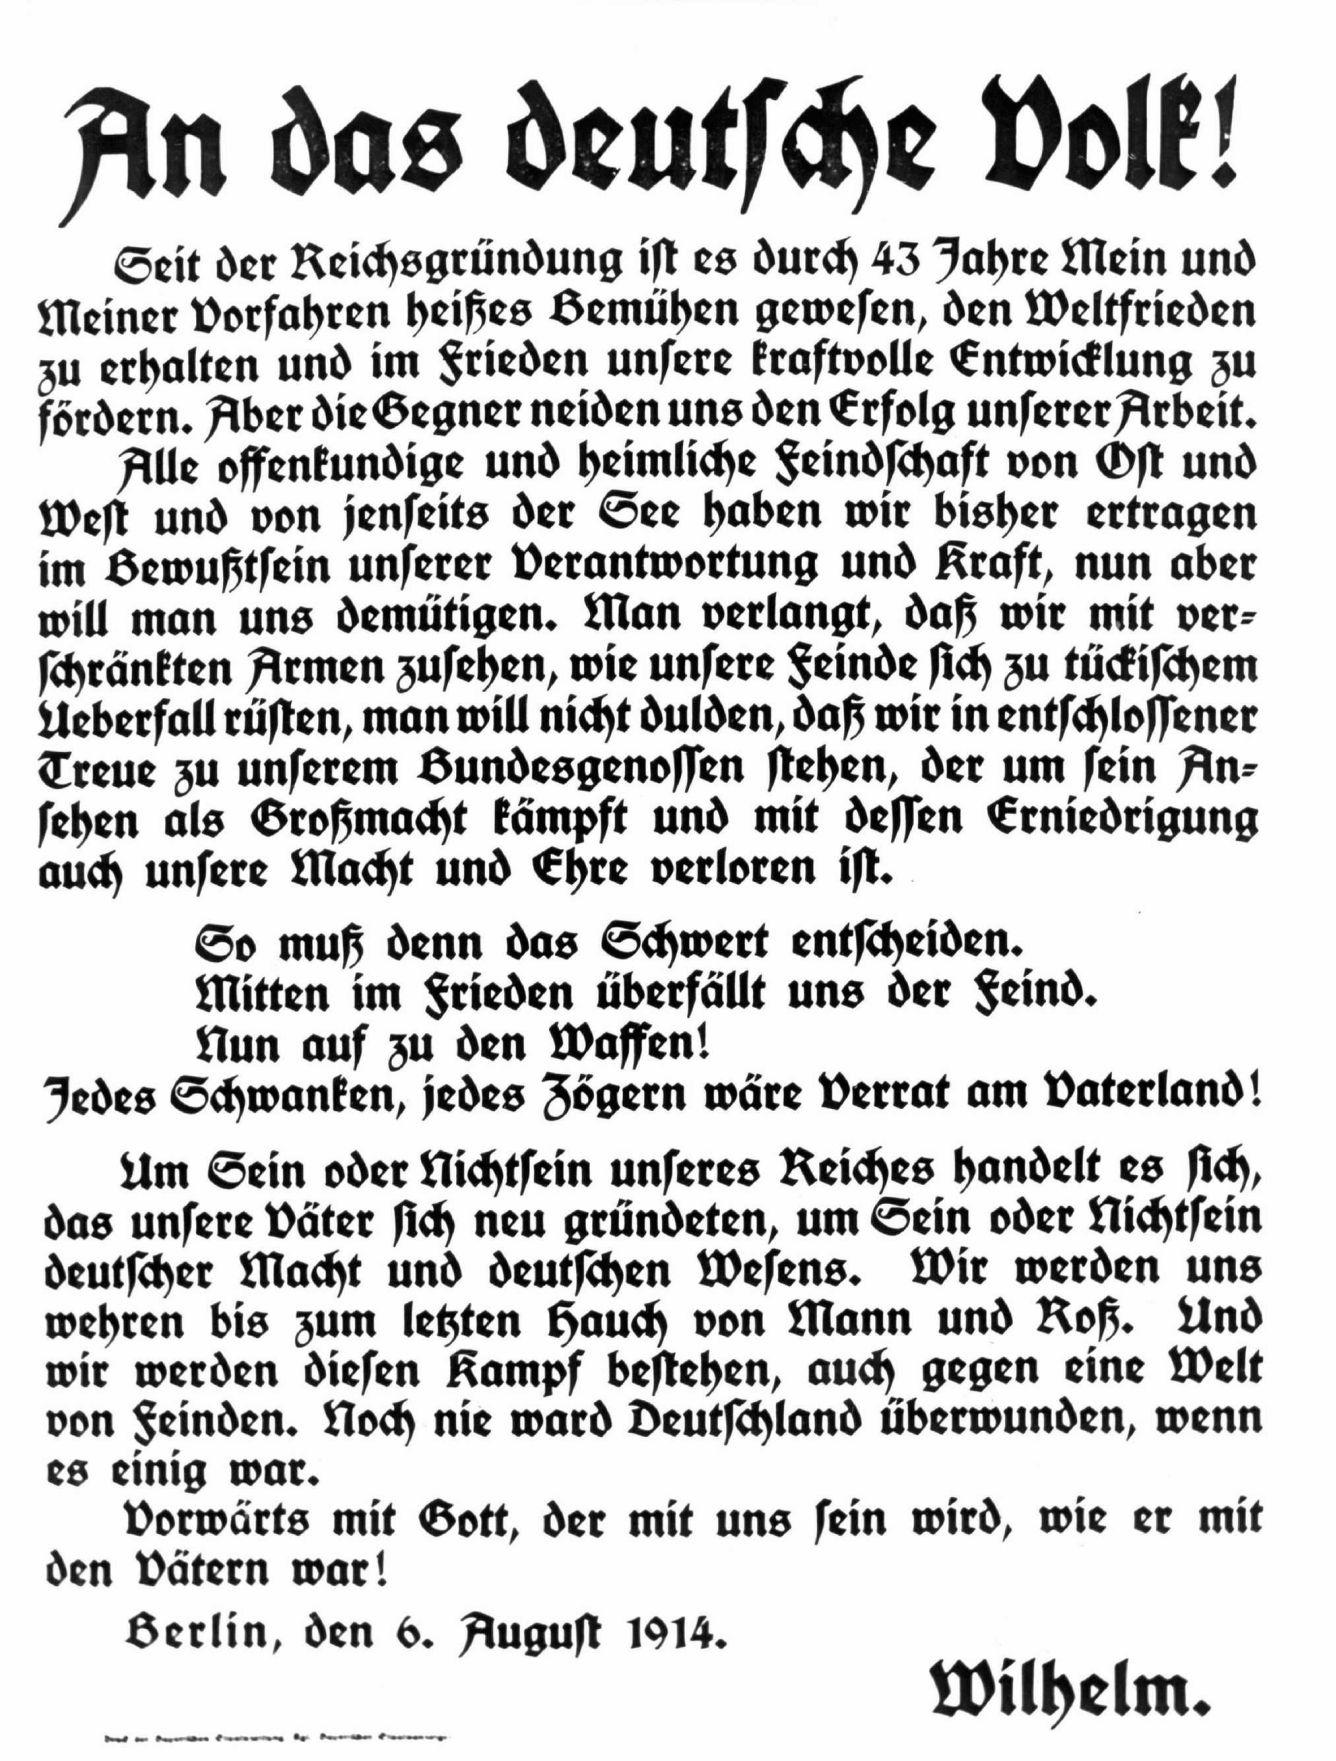 AnDasDeutscheVolkWilhelm1914.jpg (1336×1761)